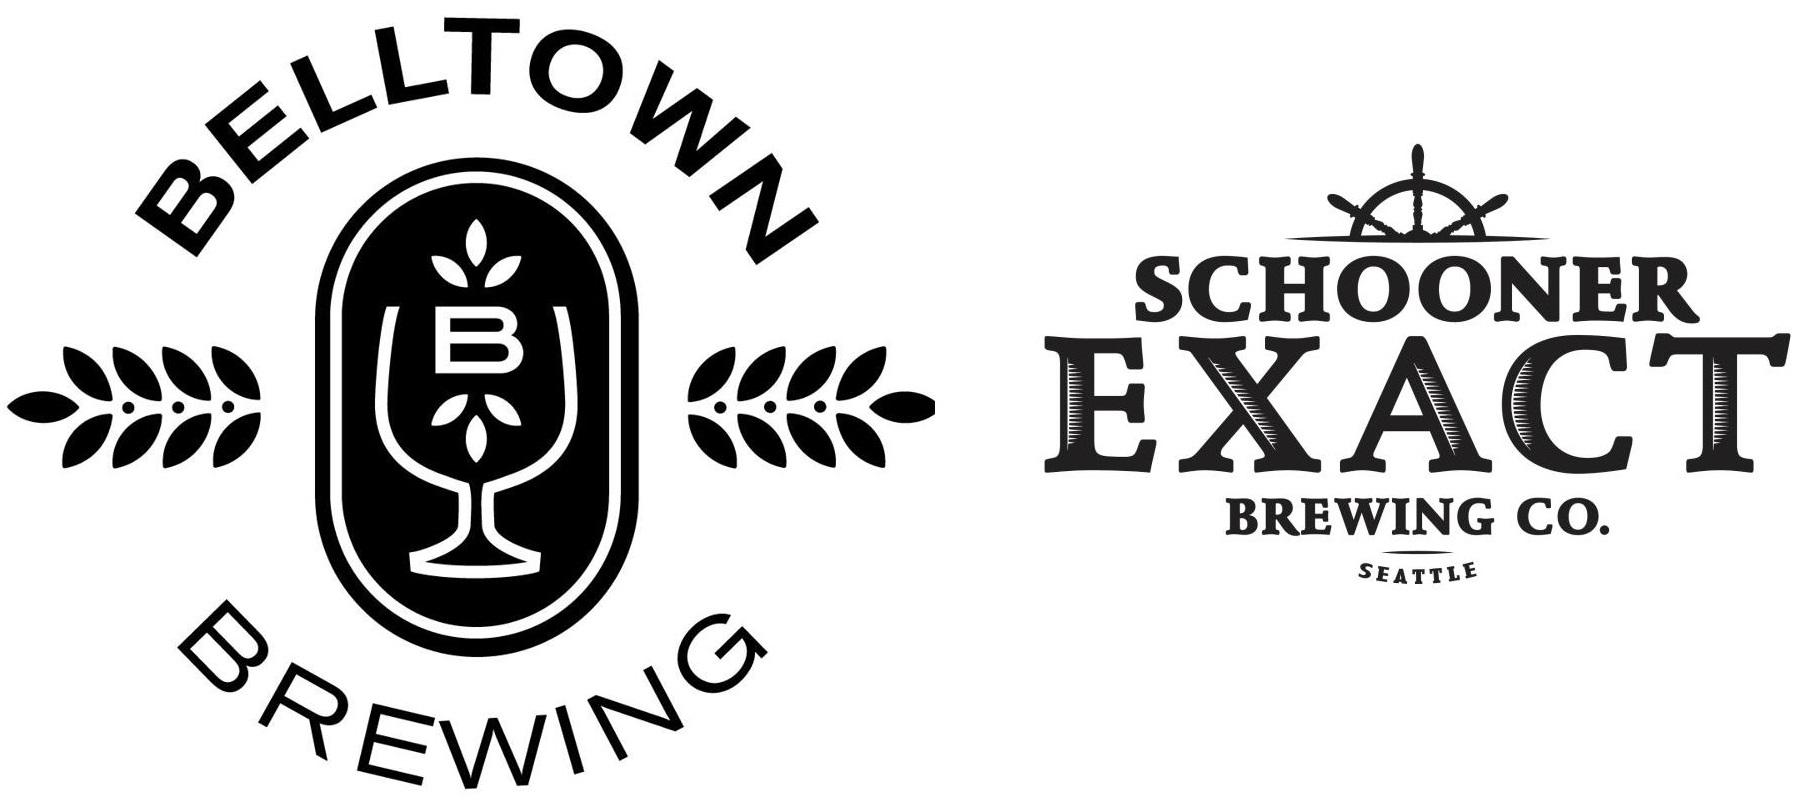 Belltown & Schooner Exact Team Up To Create SODO Brewing | Craft ...